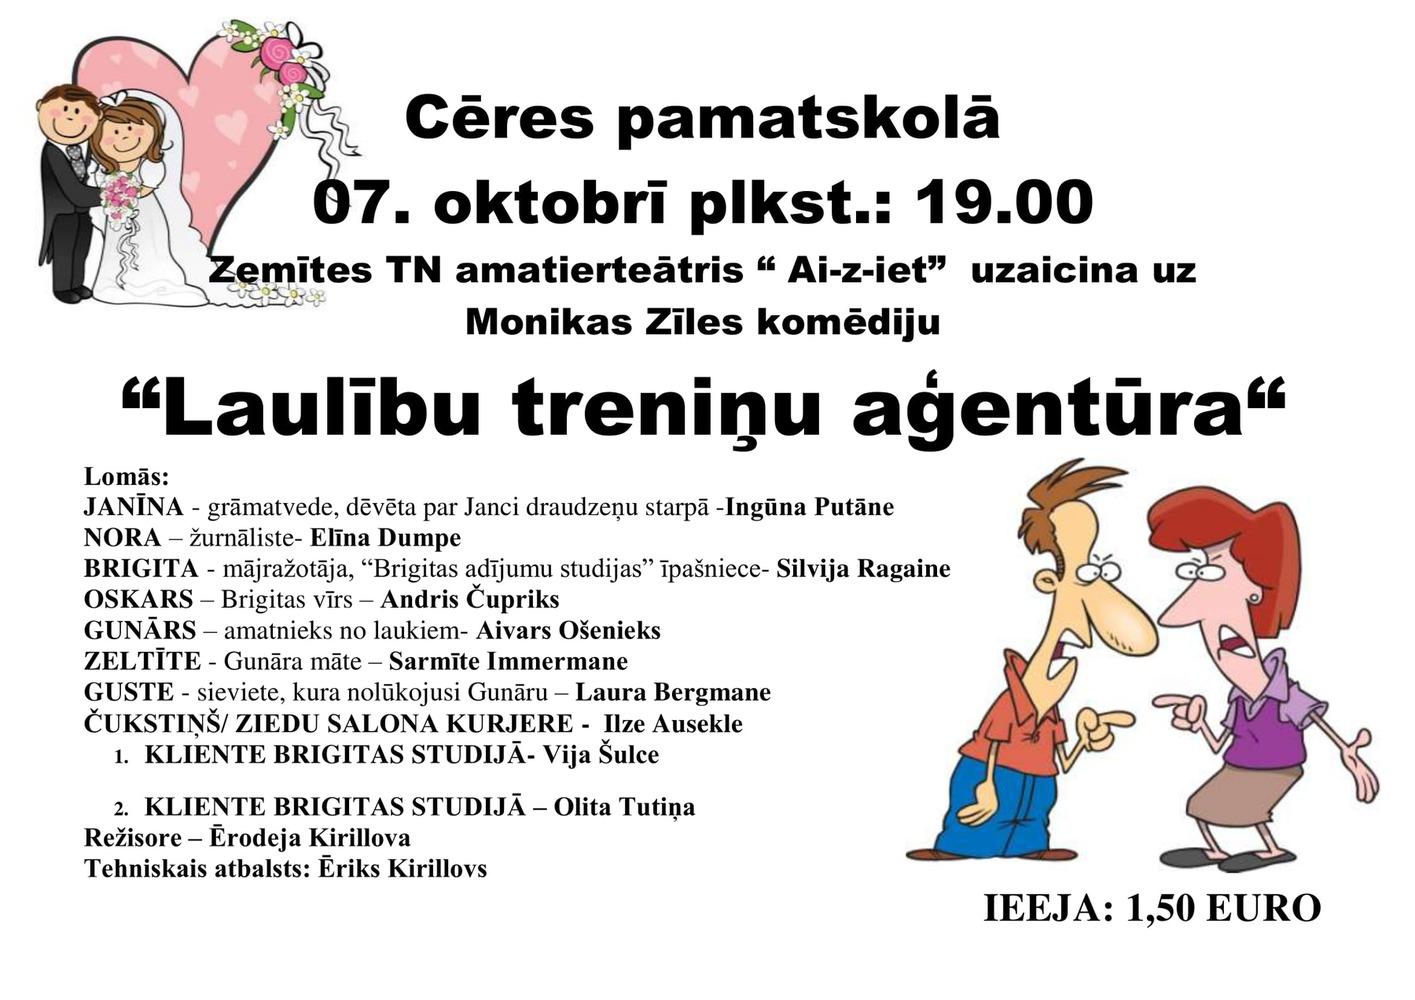 af_laulibu_treninu_agentura_2019_2_1.jpg